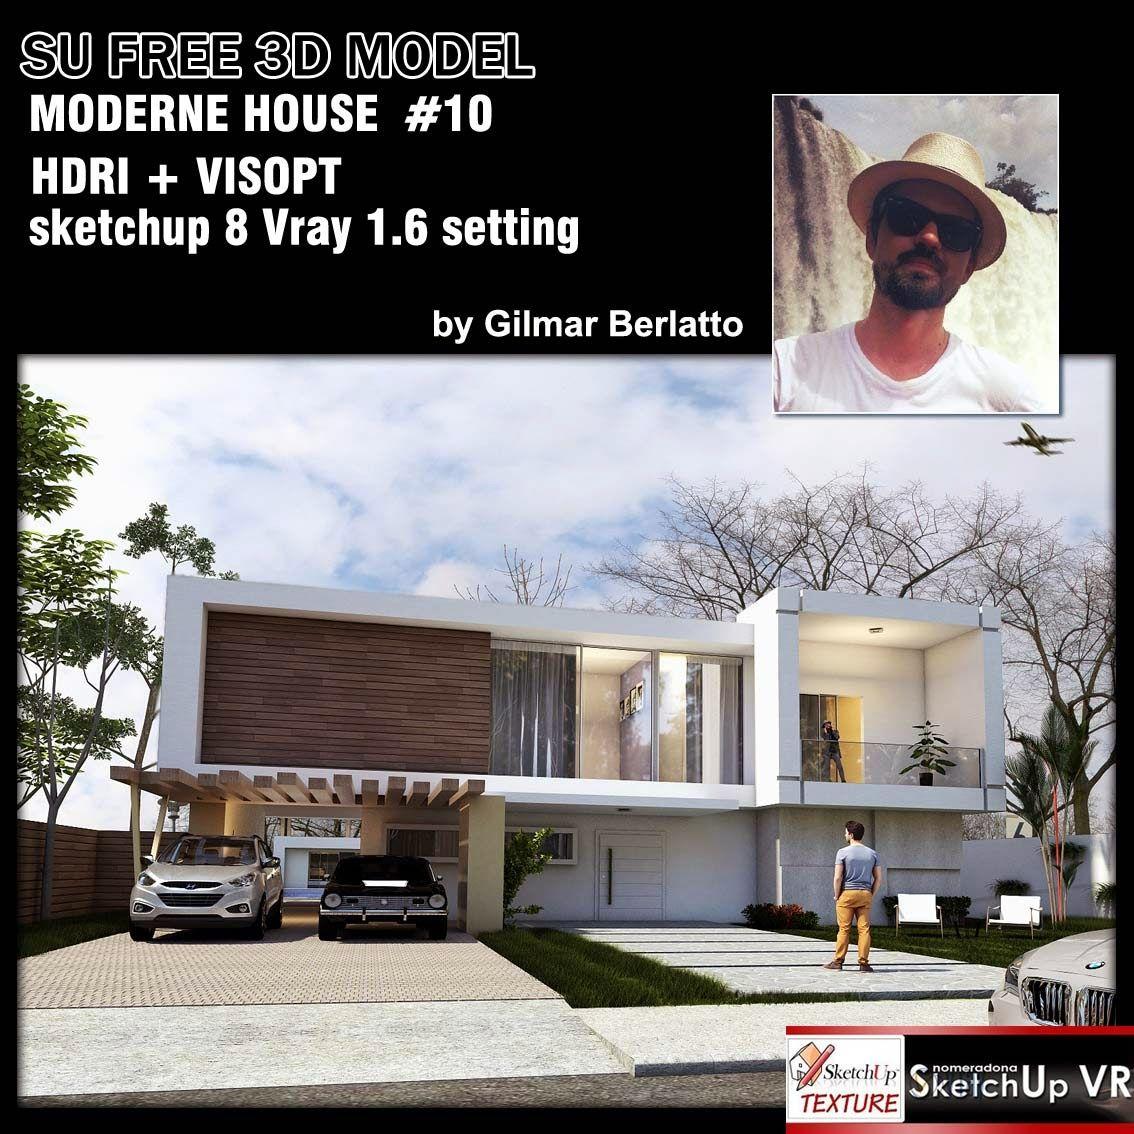 sketchup3d modelmoderne house 10by Gilmar Berlatto vray 16